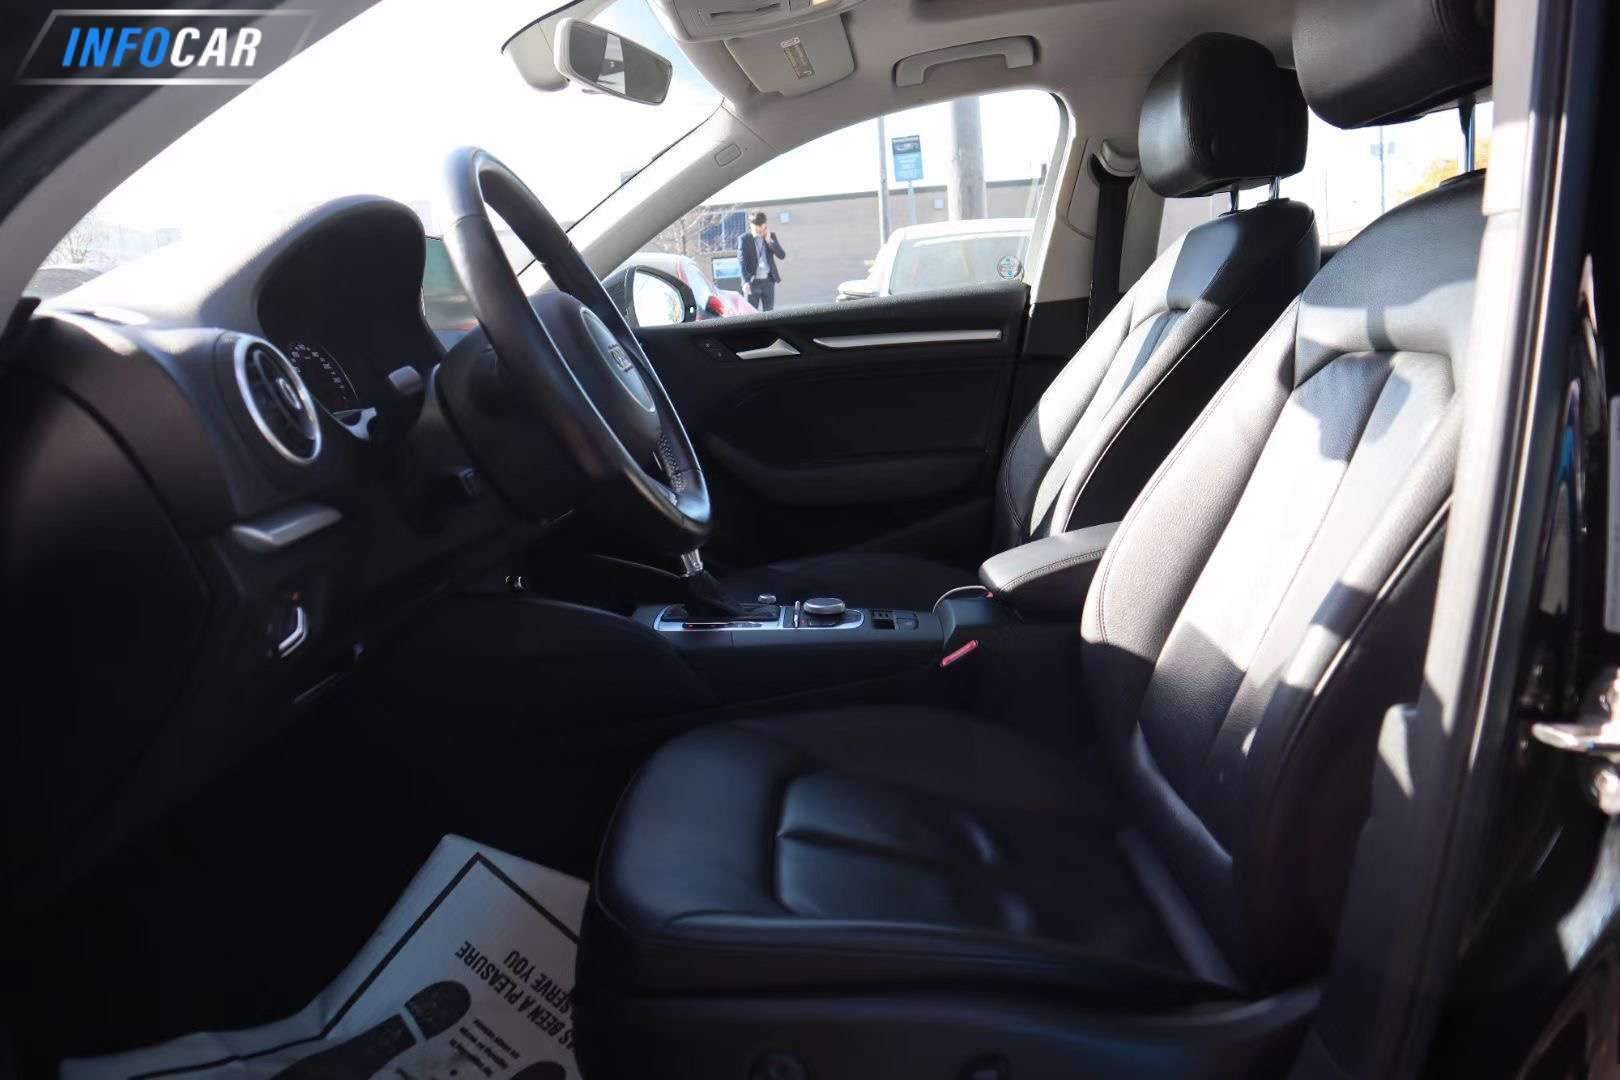 2016 Audi A3 a3 progressive - INFOCAR - Toronto's Most Comprehensive New and Used Auto Trading Platform